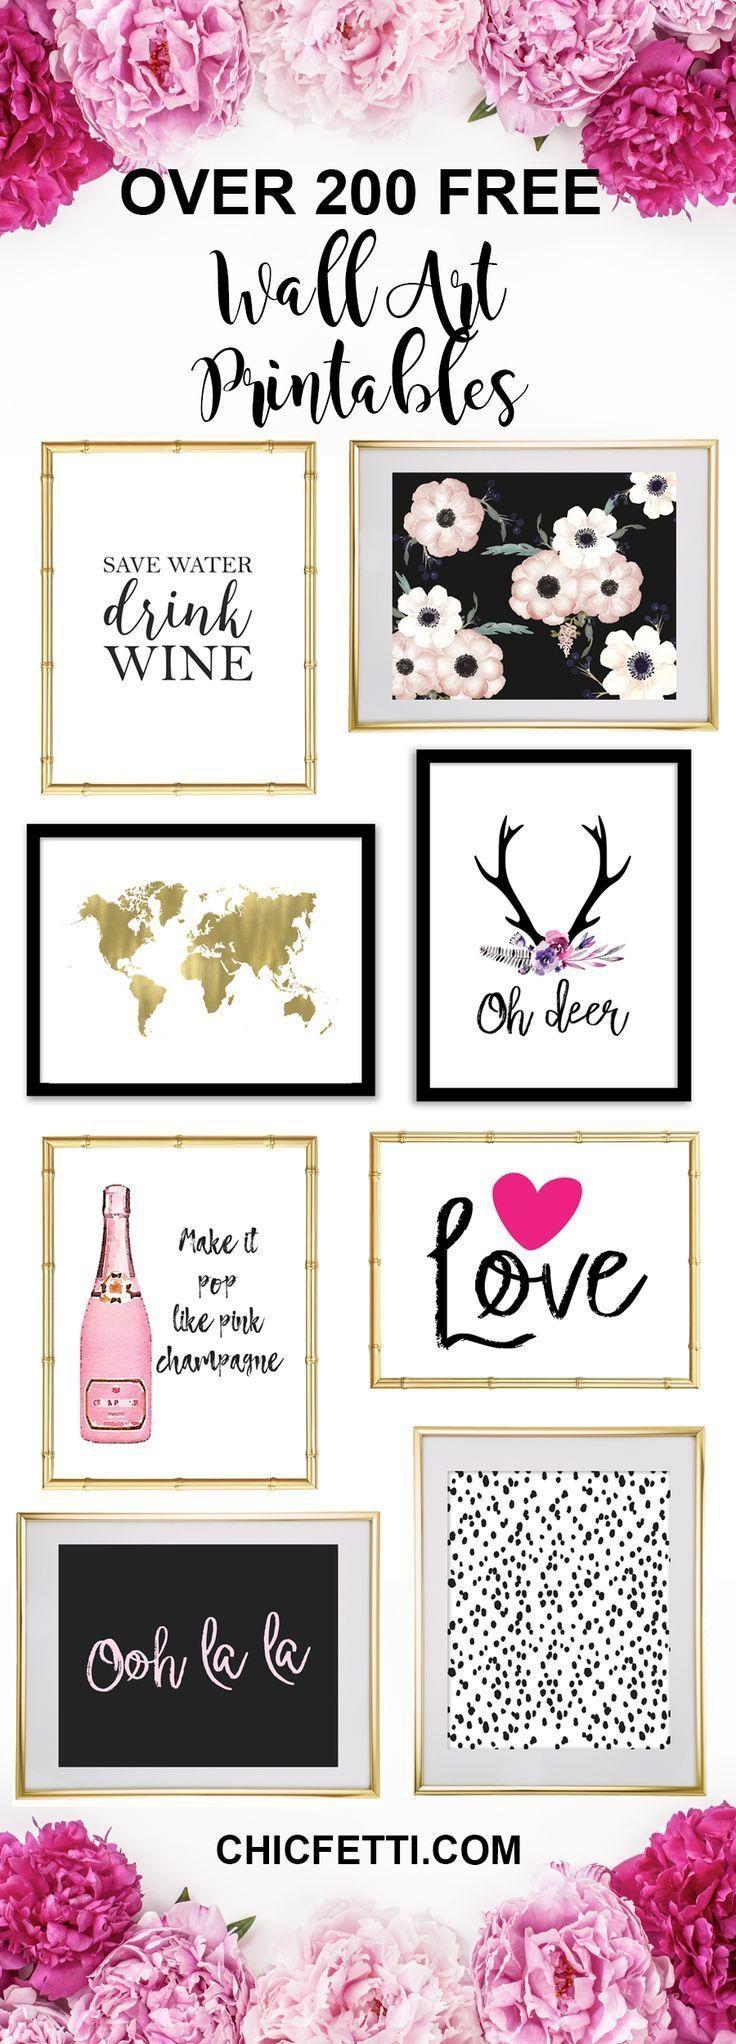 Best 25+ Wine Wall Art Ideas On Pinterest | Wine Wall Decor With Wine Theme Wall Art (Image 4 of 20)